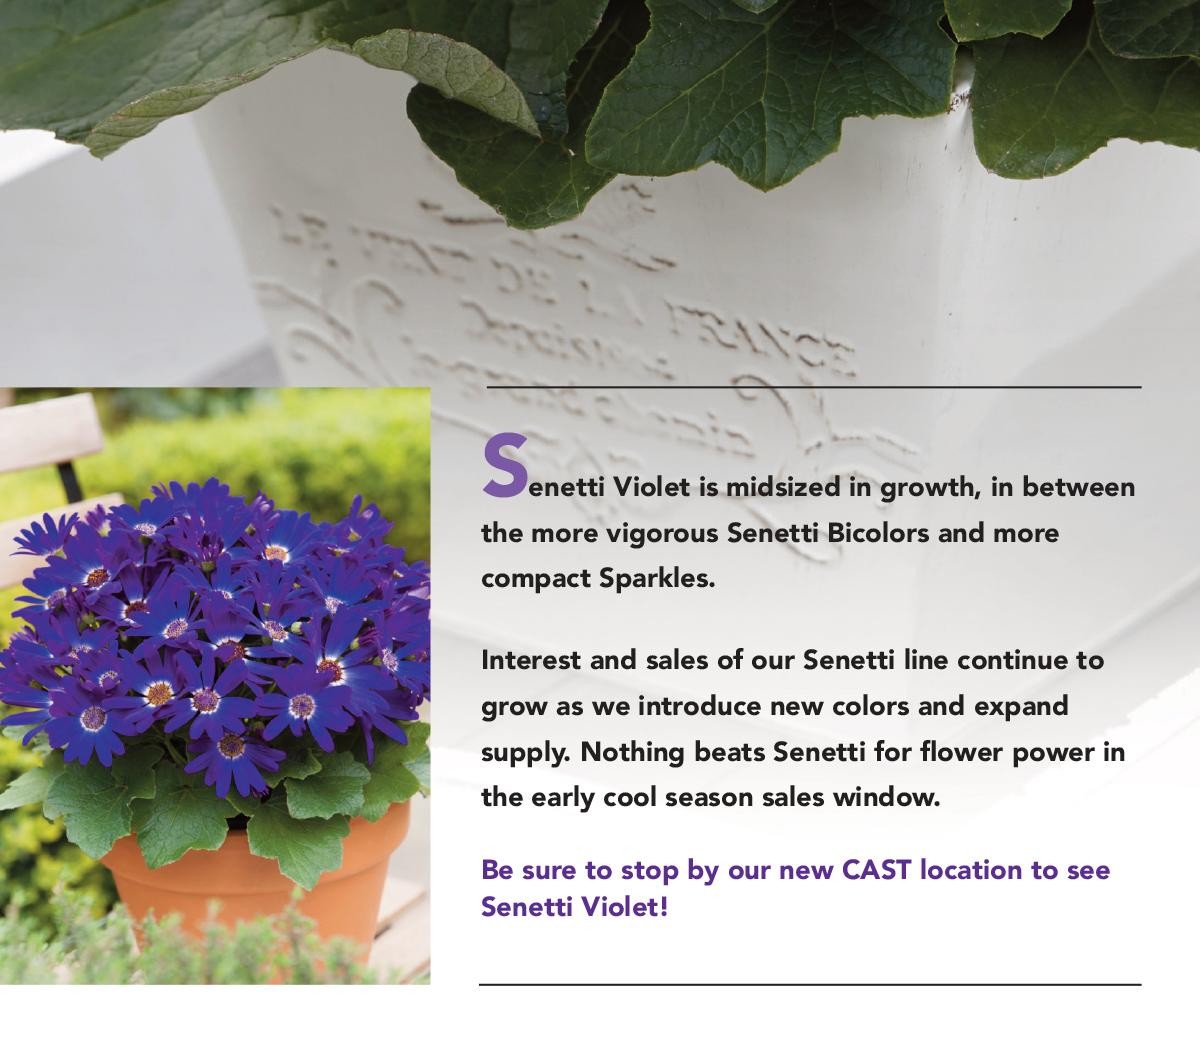 Nothing beats Senetti for flower power in the early cool season sales window.